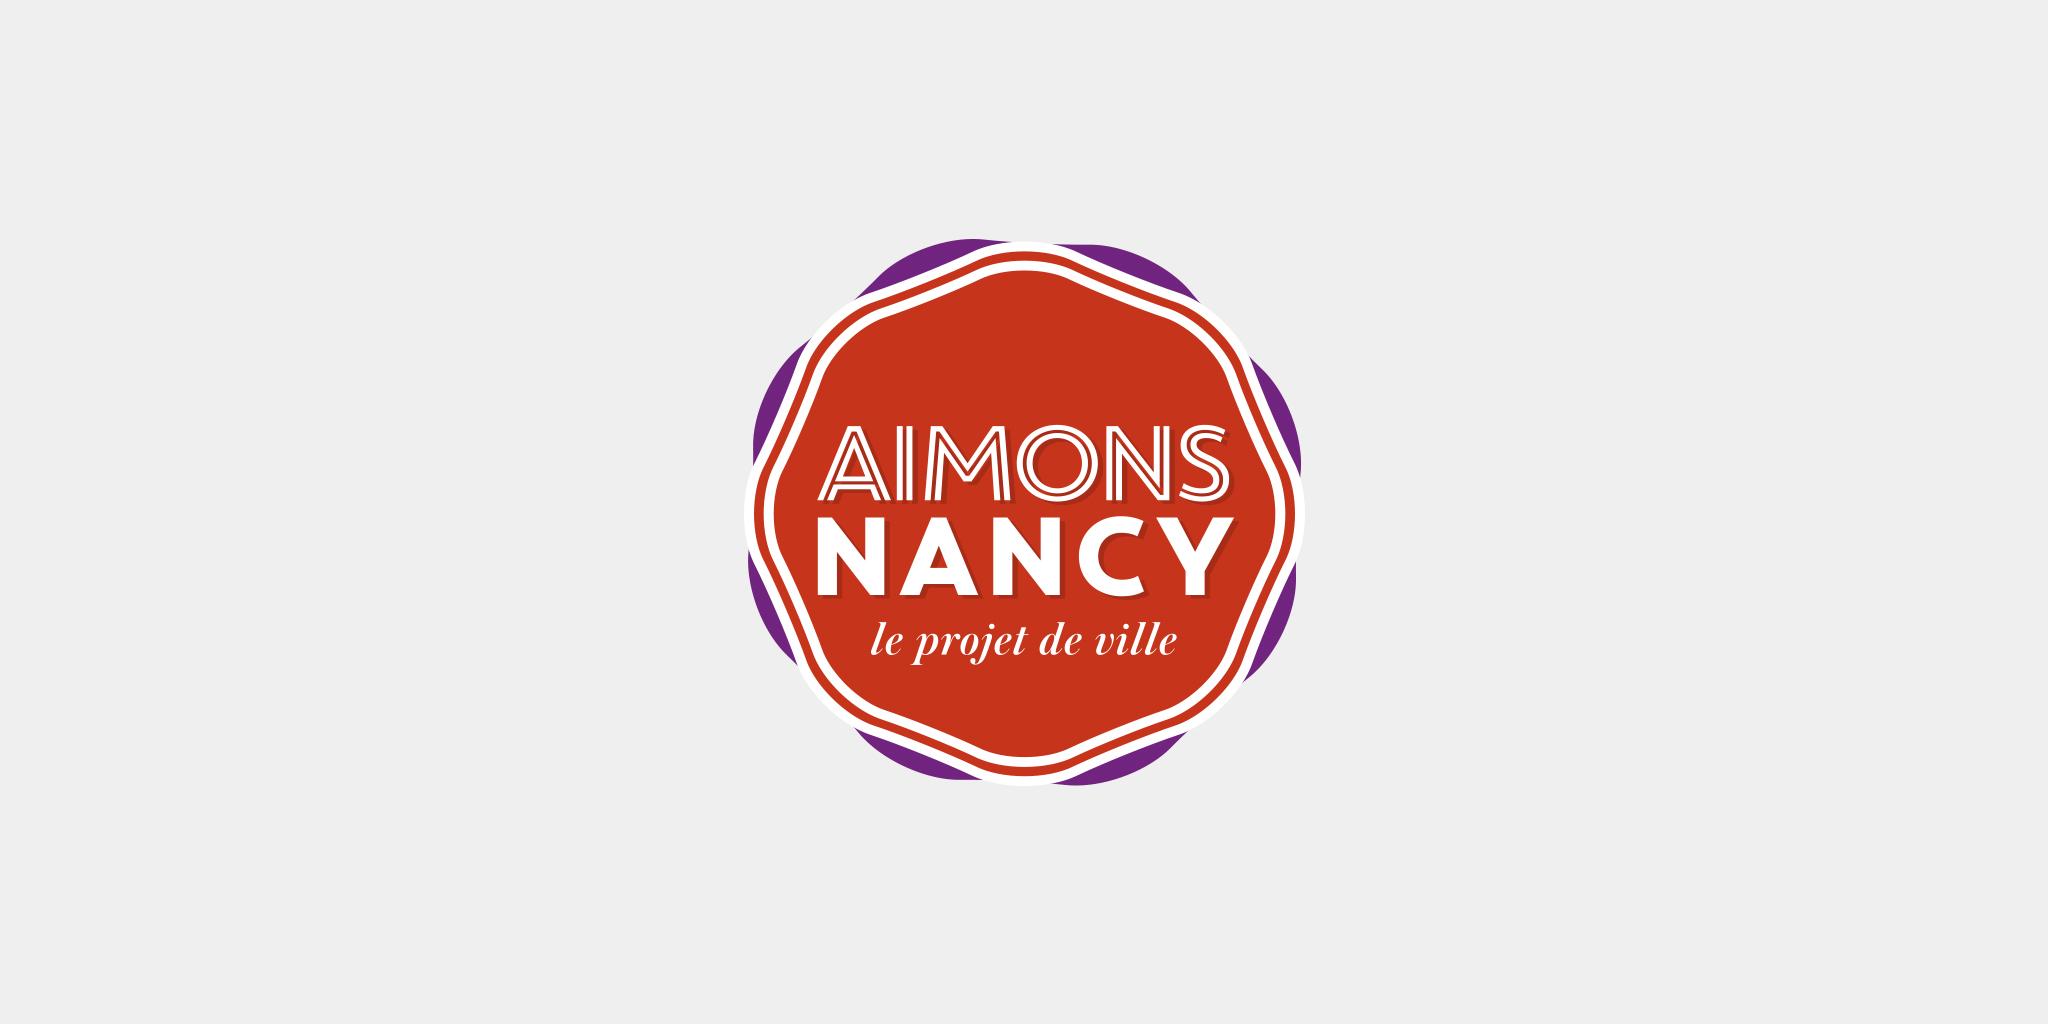 AIMONSNANCY_BUNDS1